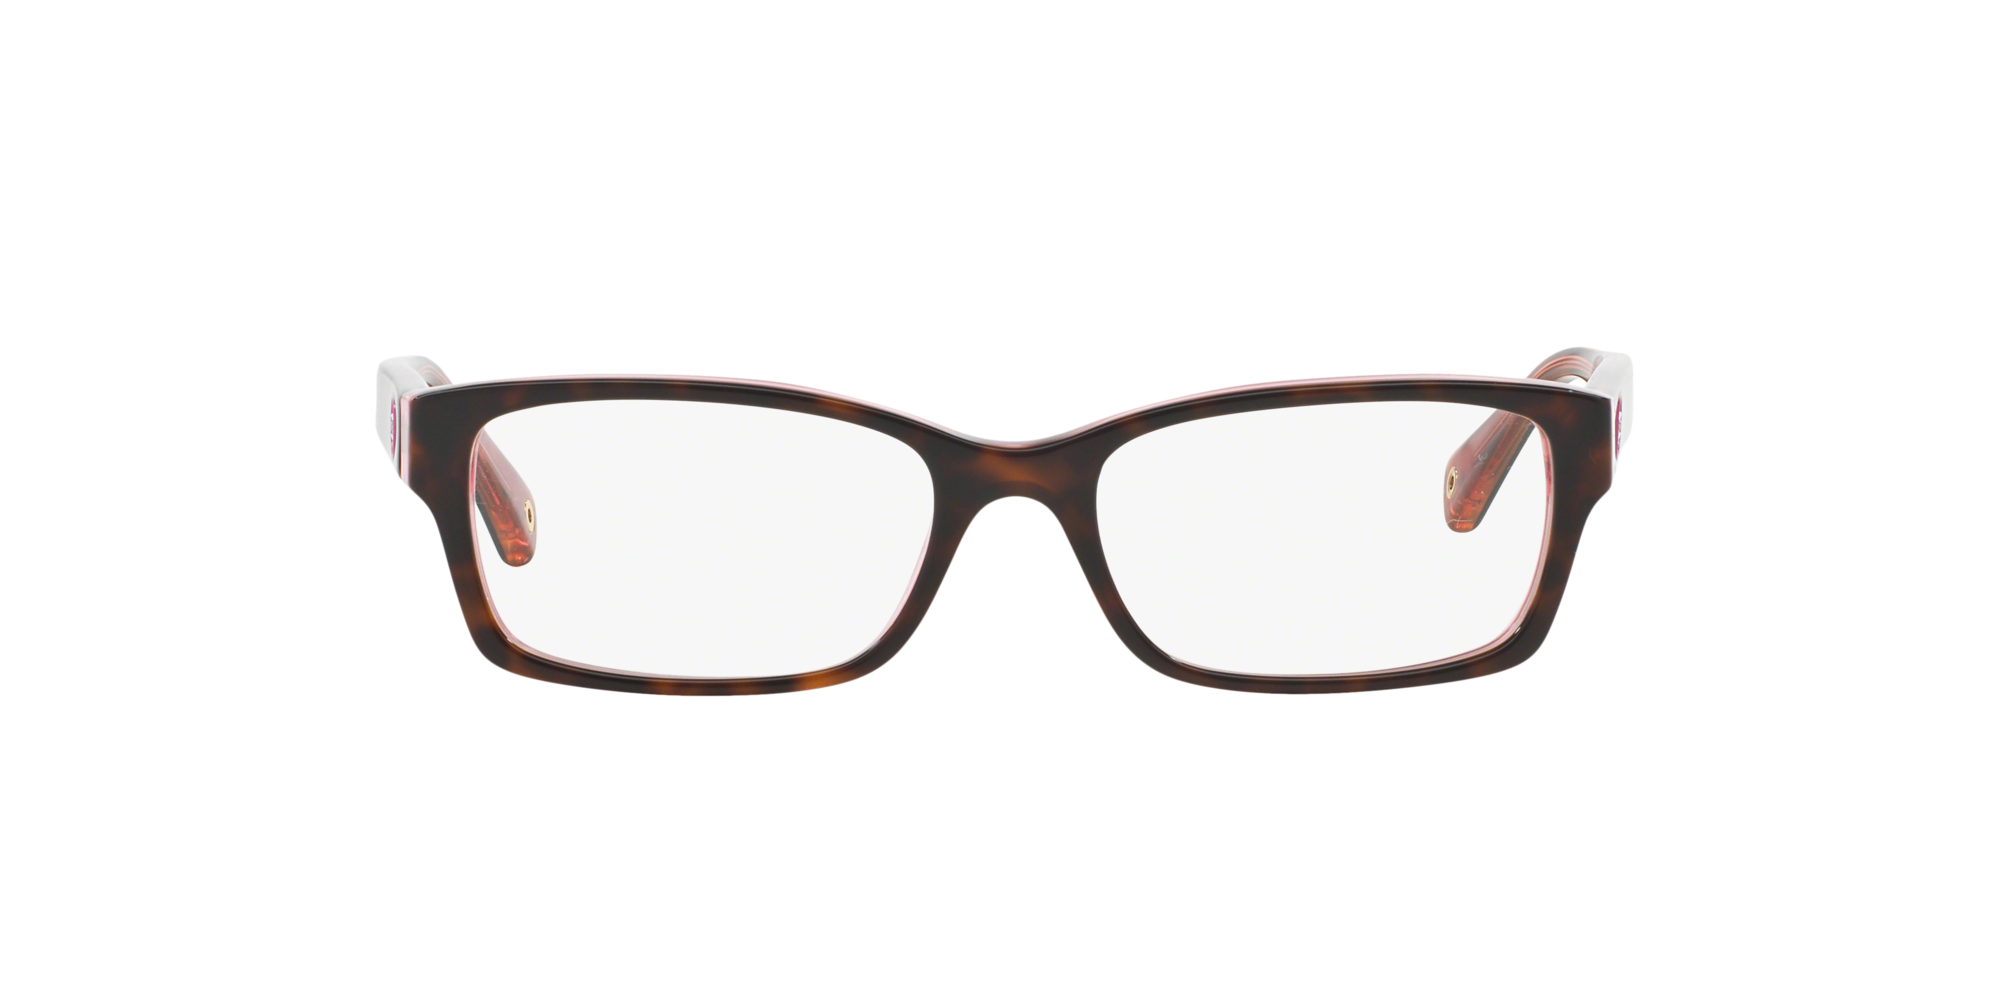 Image for HC6040 from LensCrafters | Glasses, Prescription Glasses Online, Eyewear